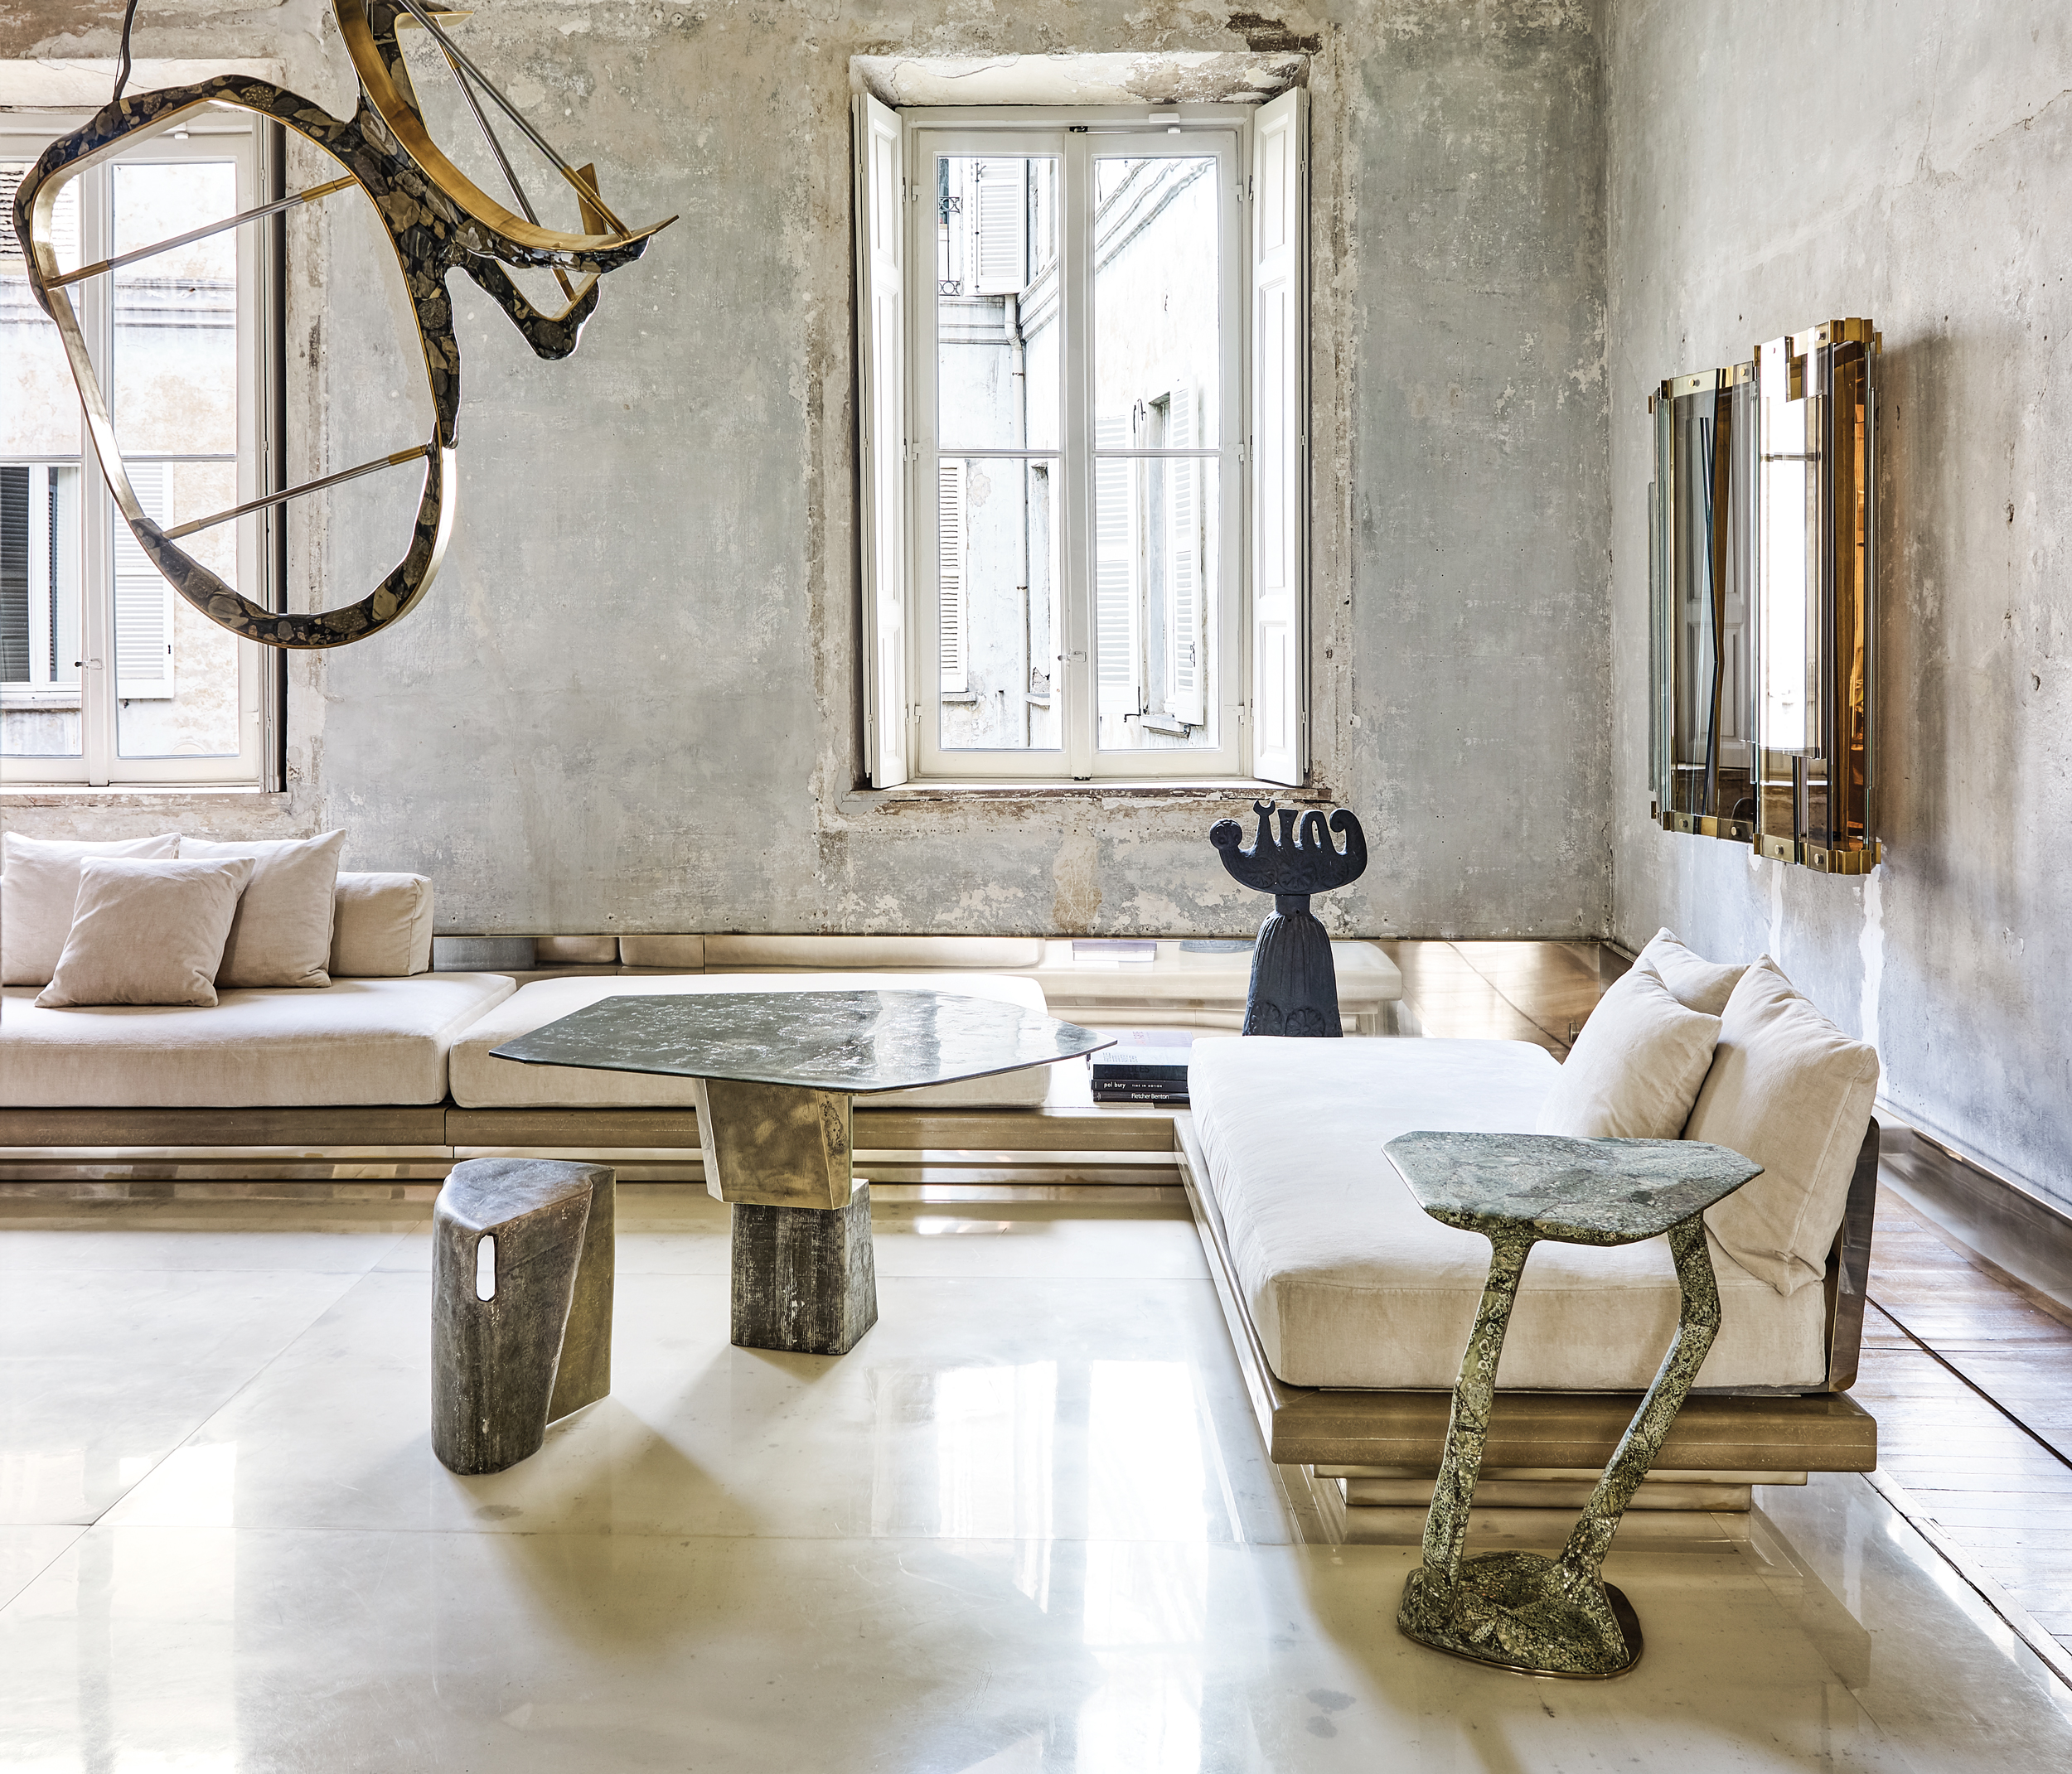 Vincenzo de Cotiis - Furniture